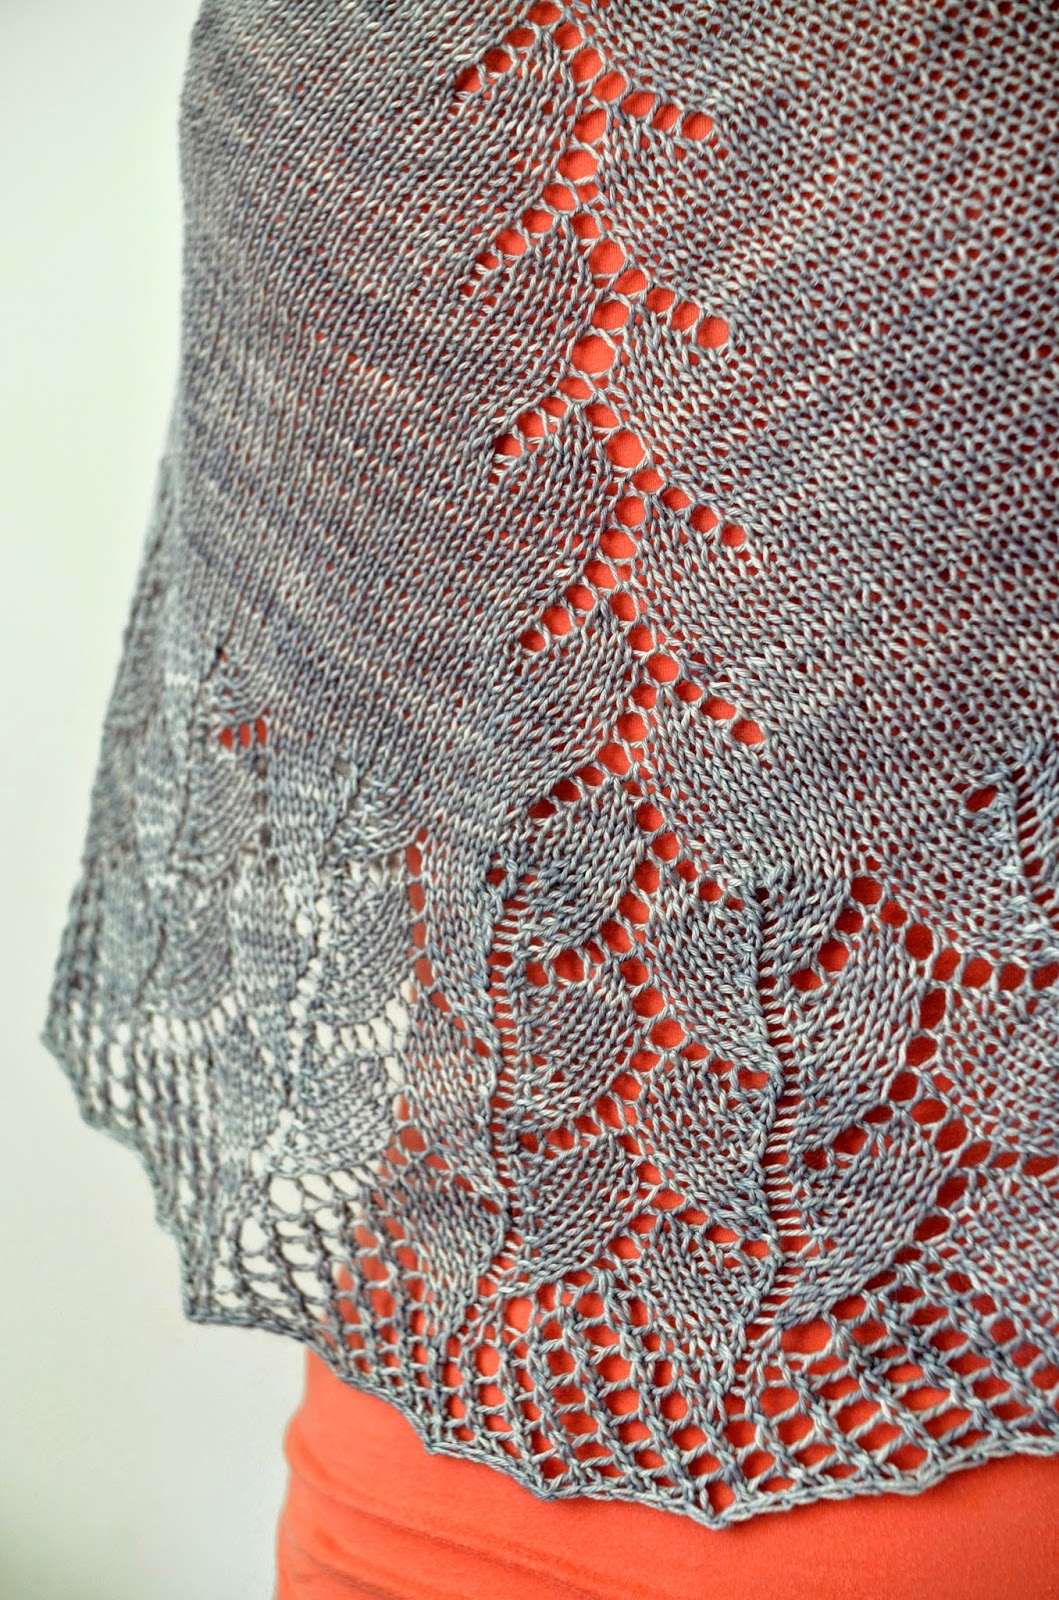 Cove Bay shawl pattern by Katya Frankel